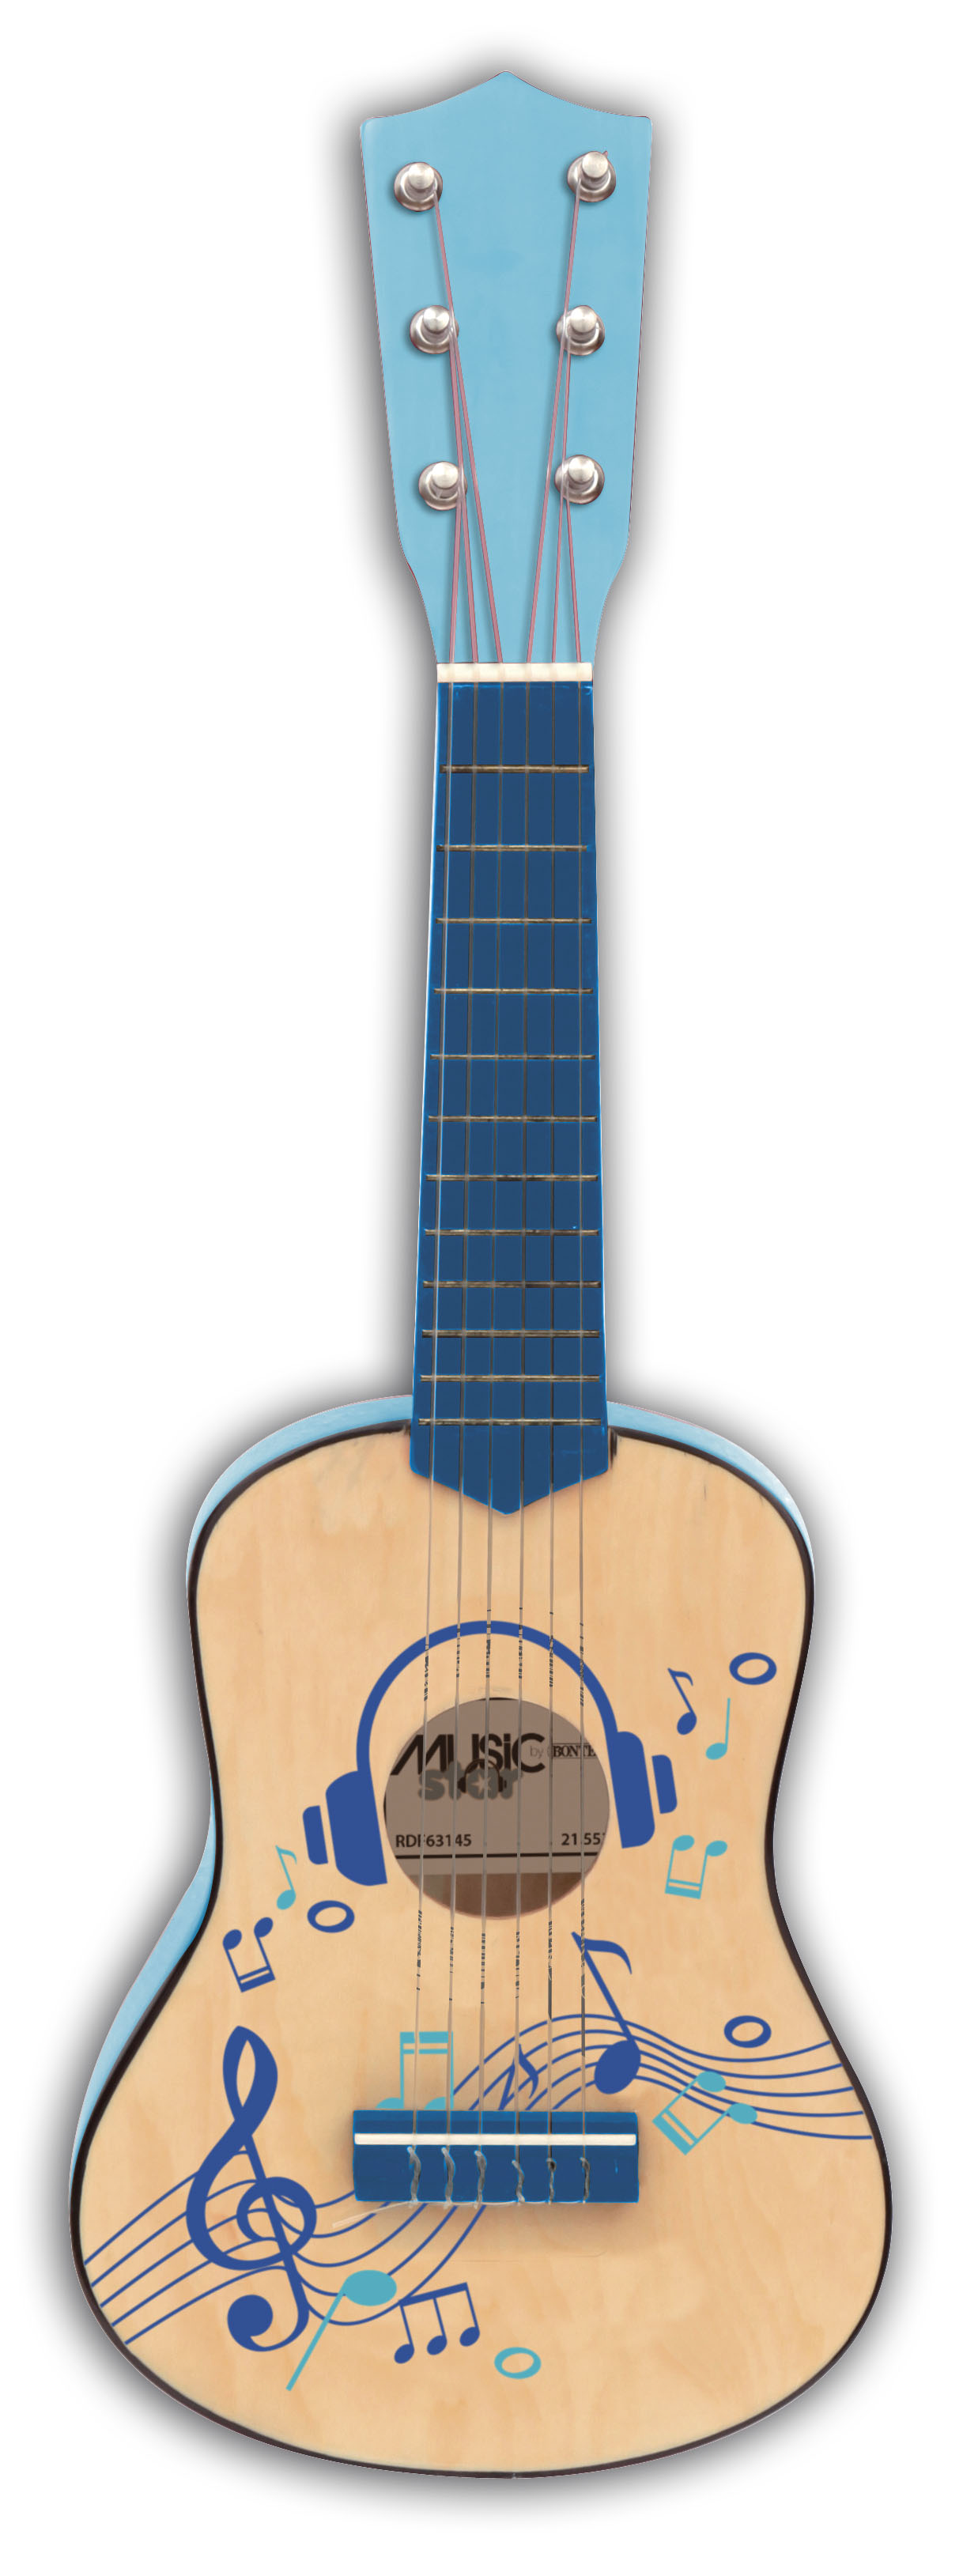 Chitarra classica in legno boy 55cm - MUSIC STAR, MUSICSTAR